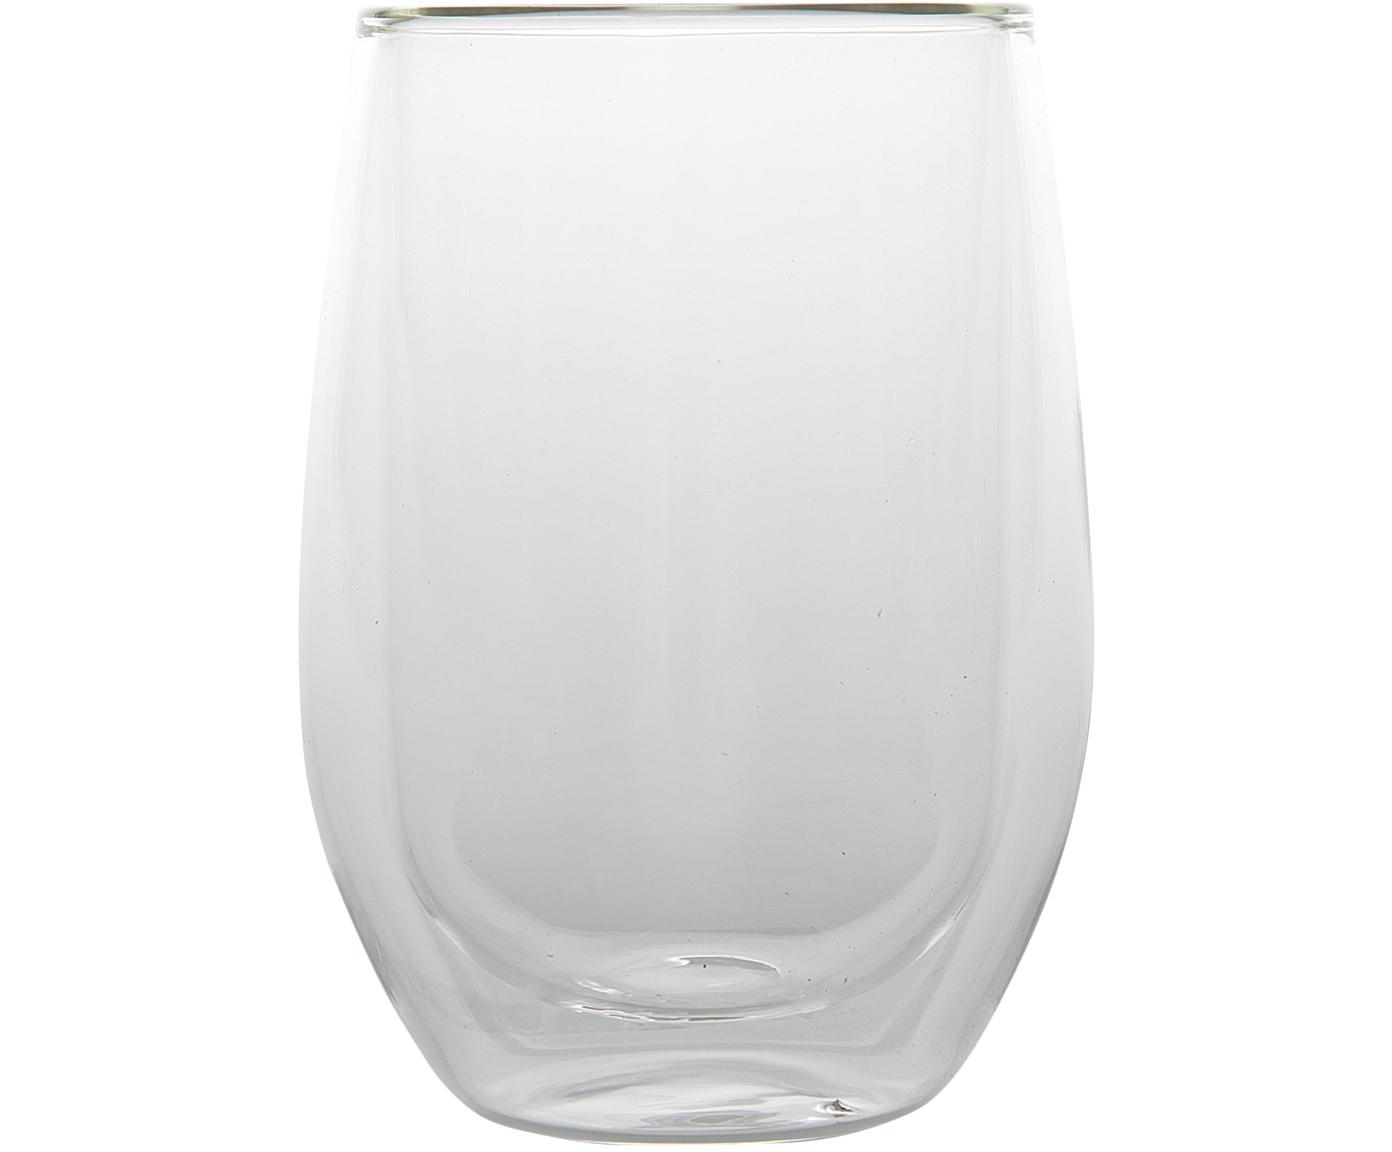 Vasos termos doble cara Isolate, 2uds., Vidrio de borosilicato, Transparente, Ø 8 x Al 13 cm